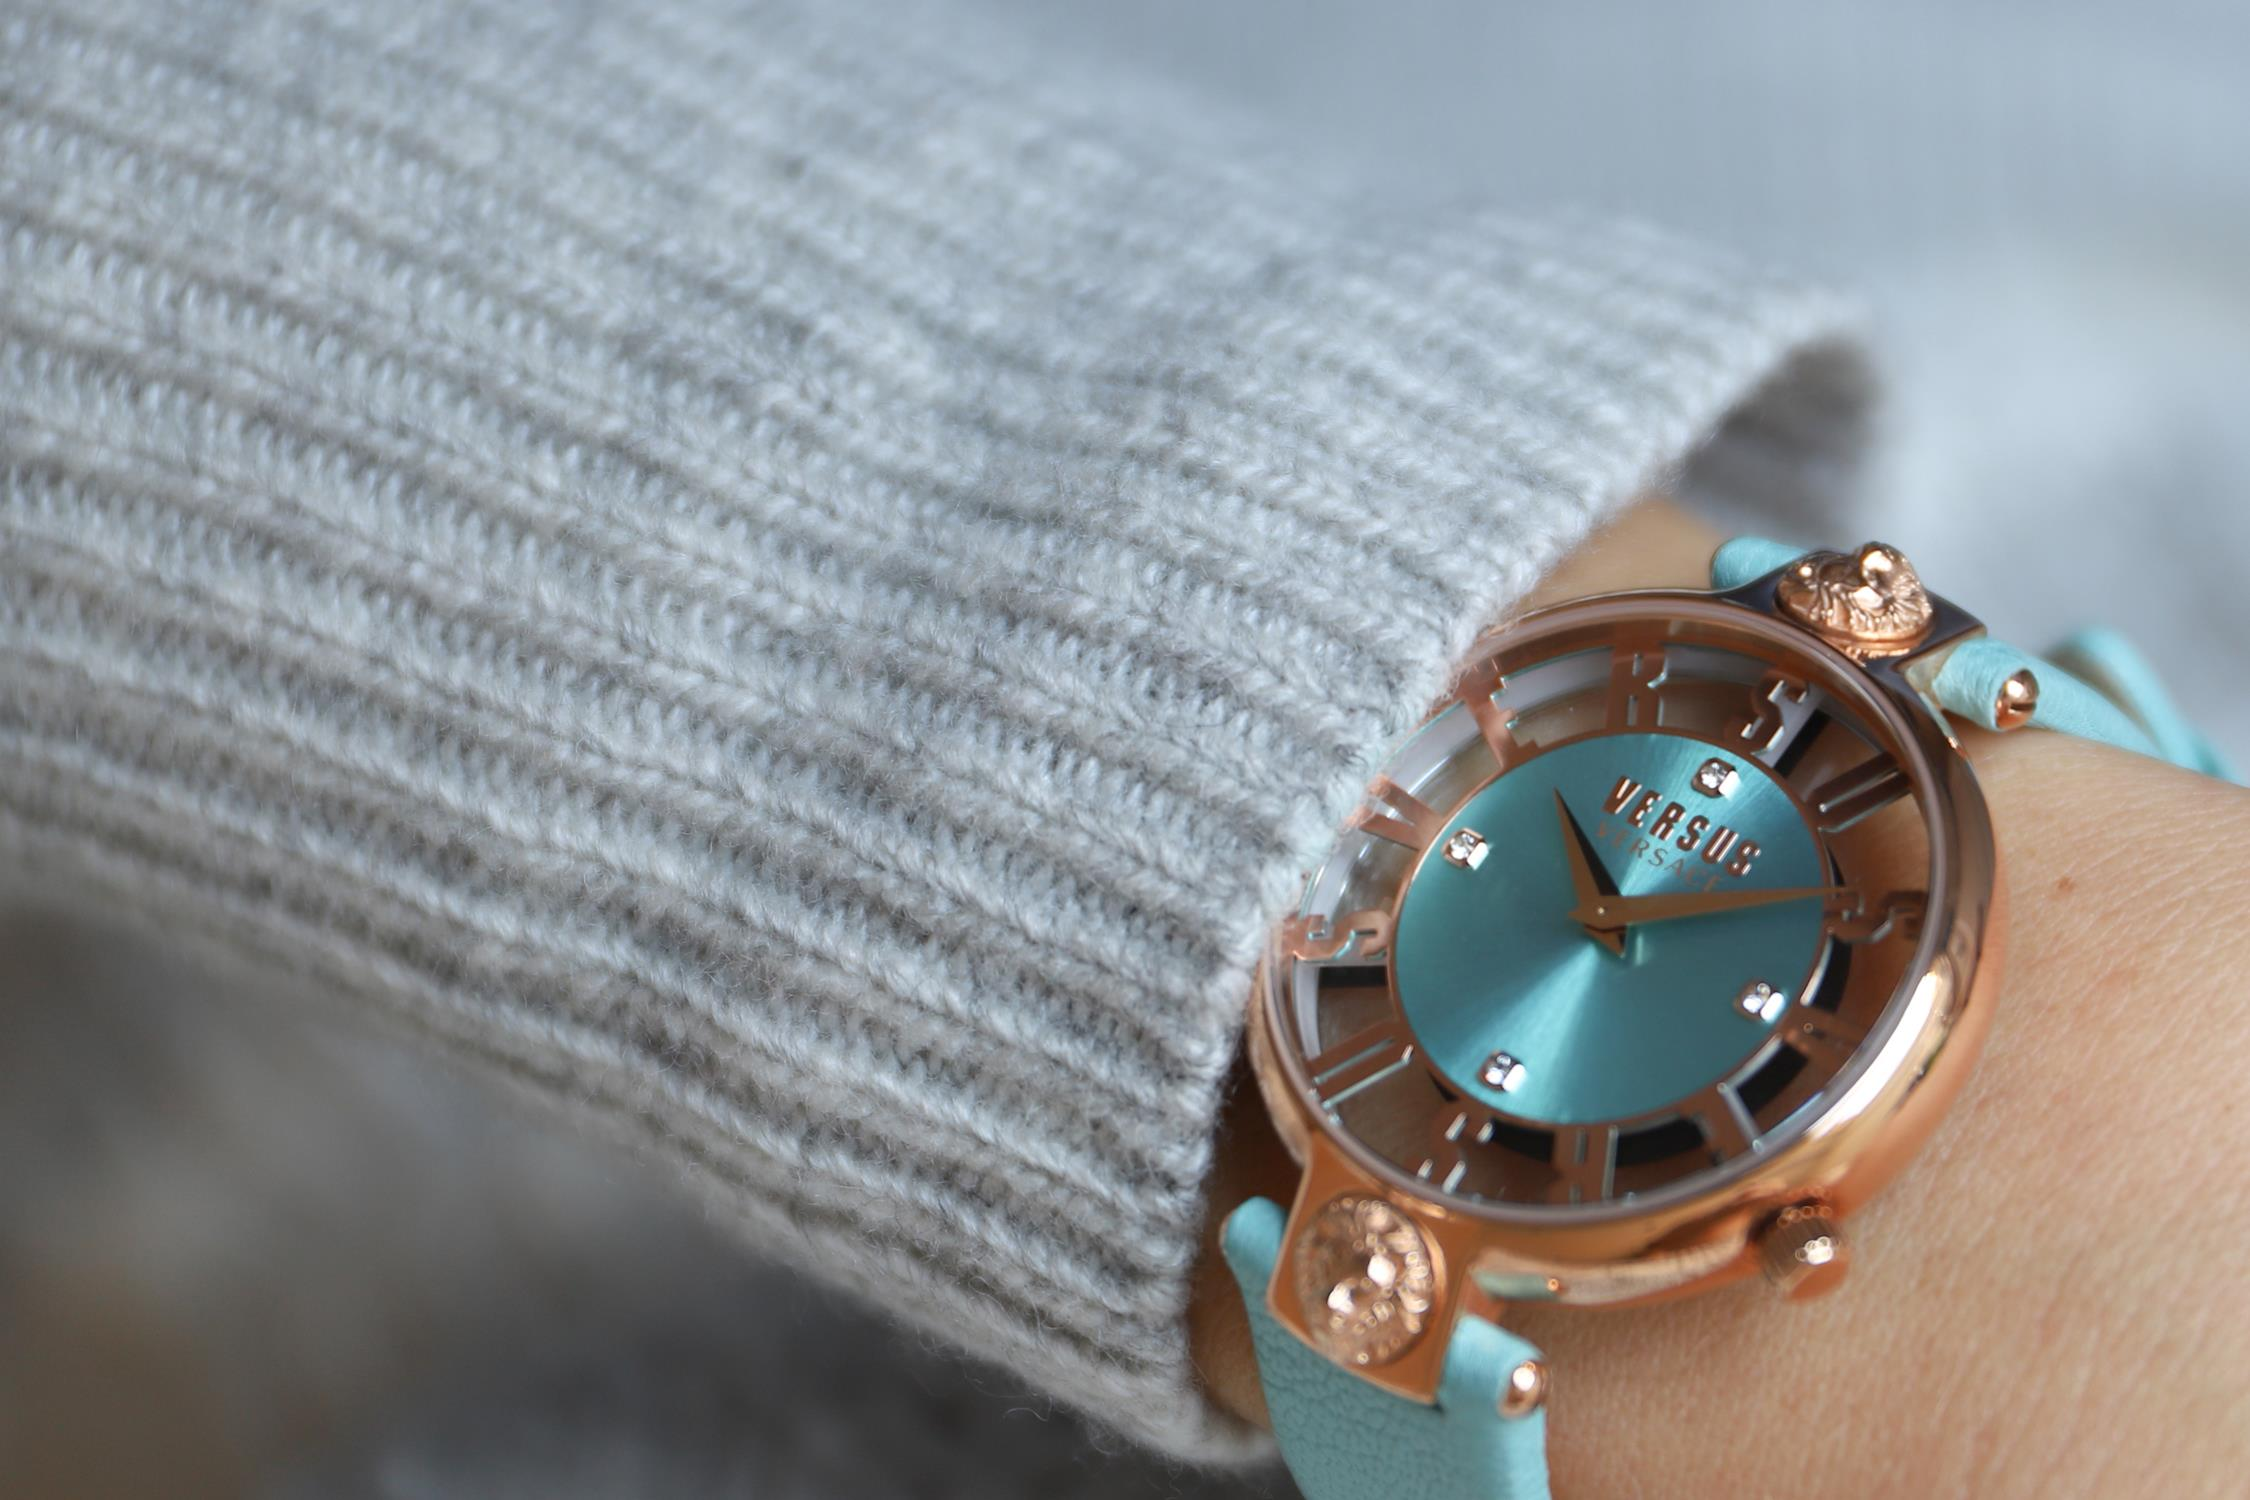 Versus Versace VSP490418 Damskie KIRSTENHOF zegarek damski fashion/modowy mineralne